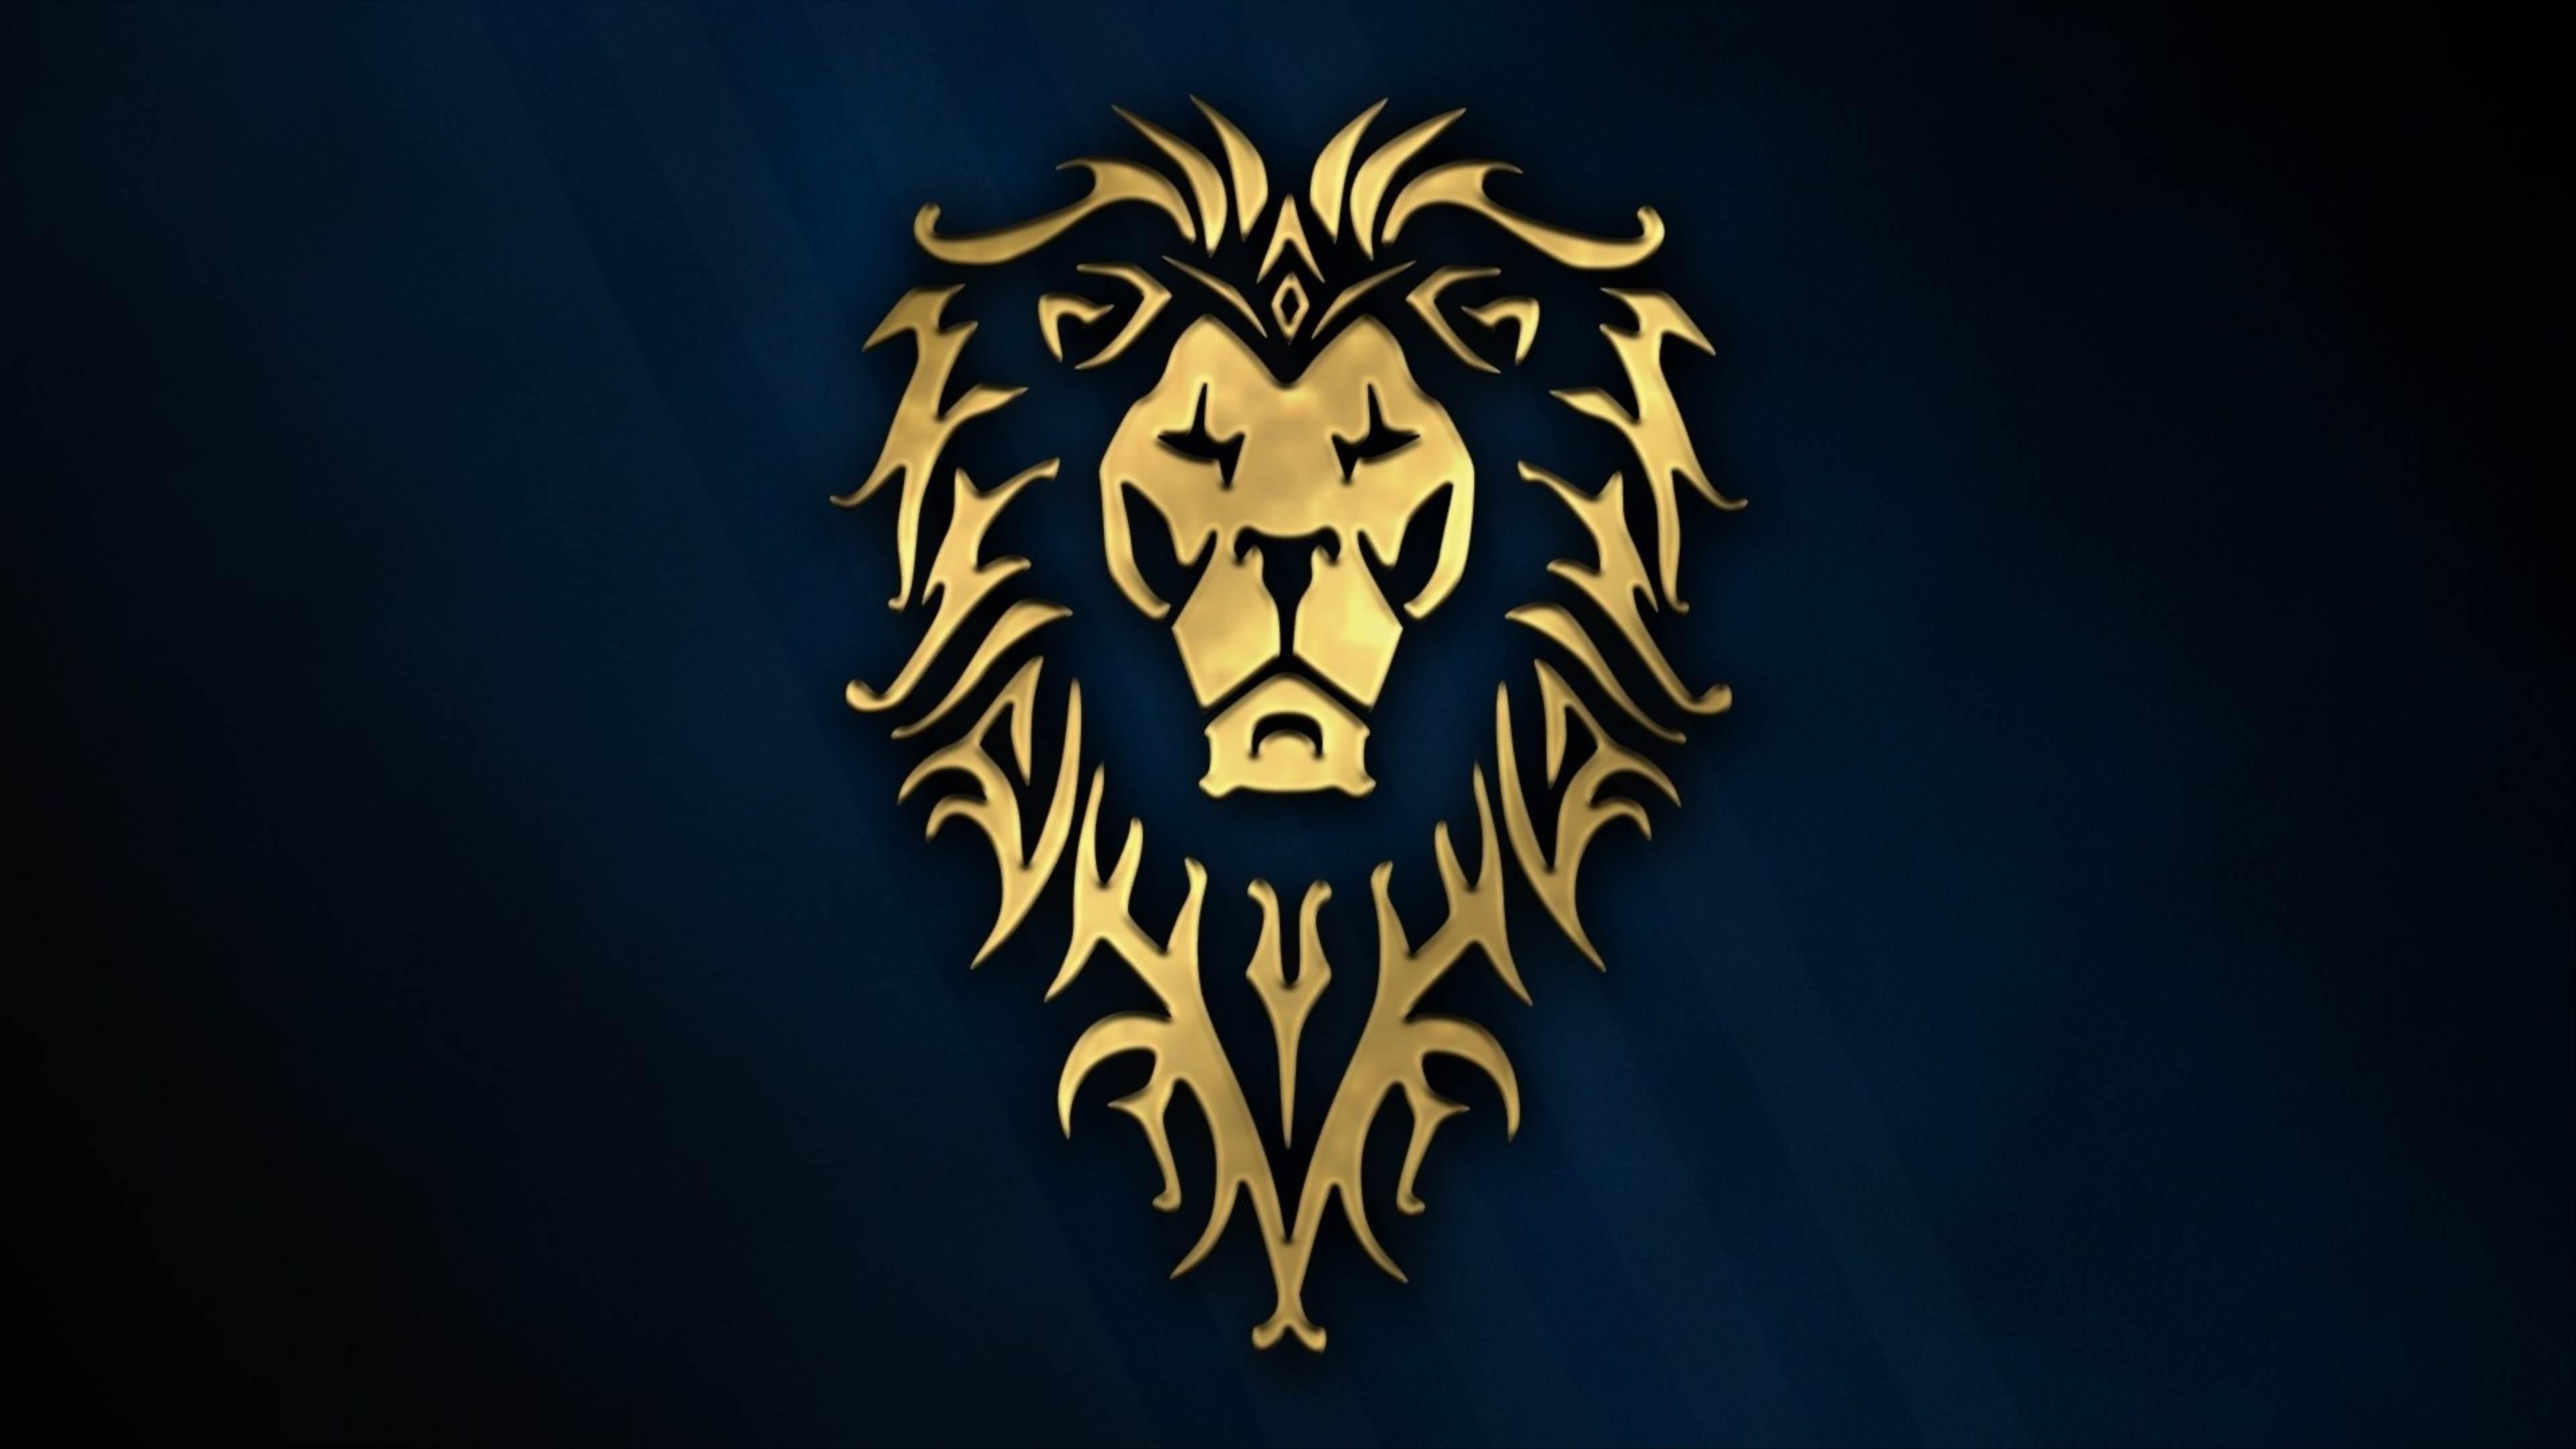 World Of Warcraft Wallpaper Hd Warcraft Movie Logo Hd Movies 4k Wallpapers Images